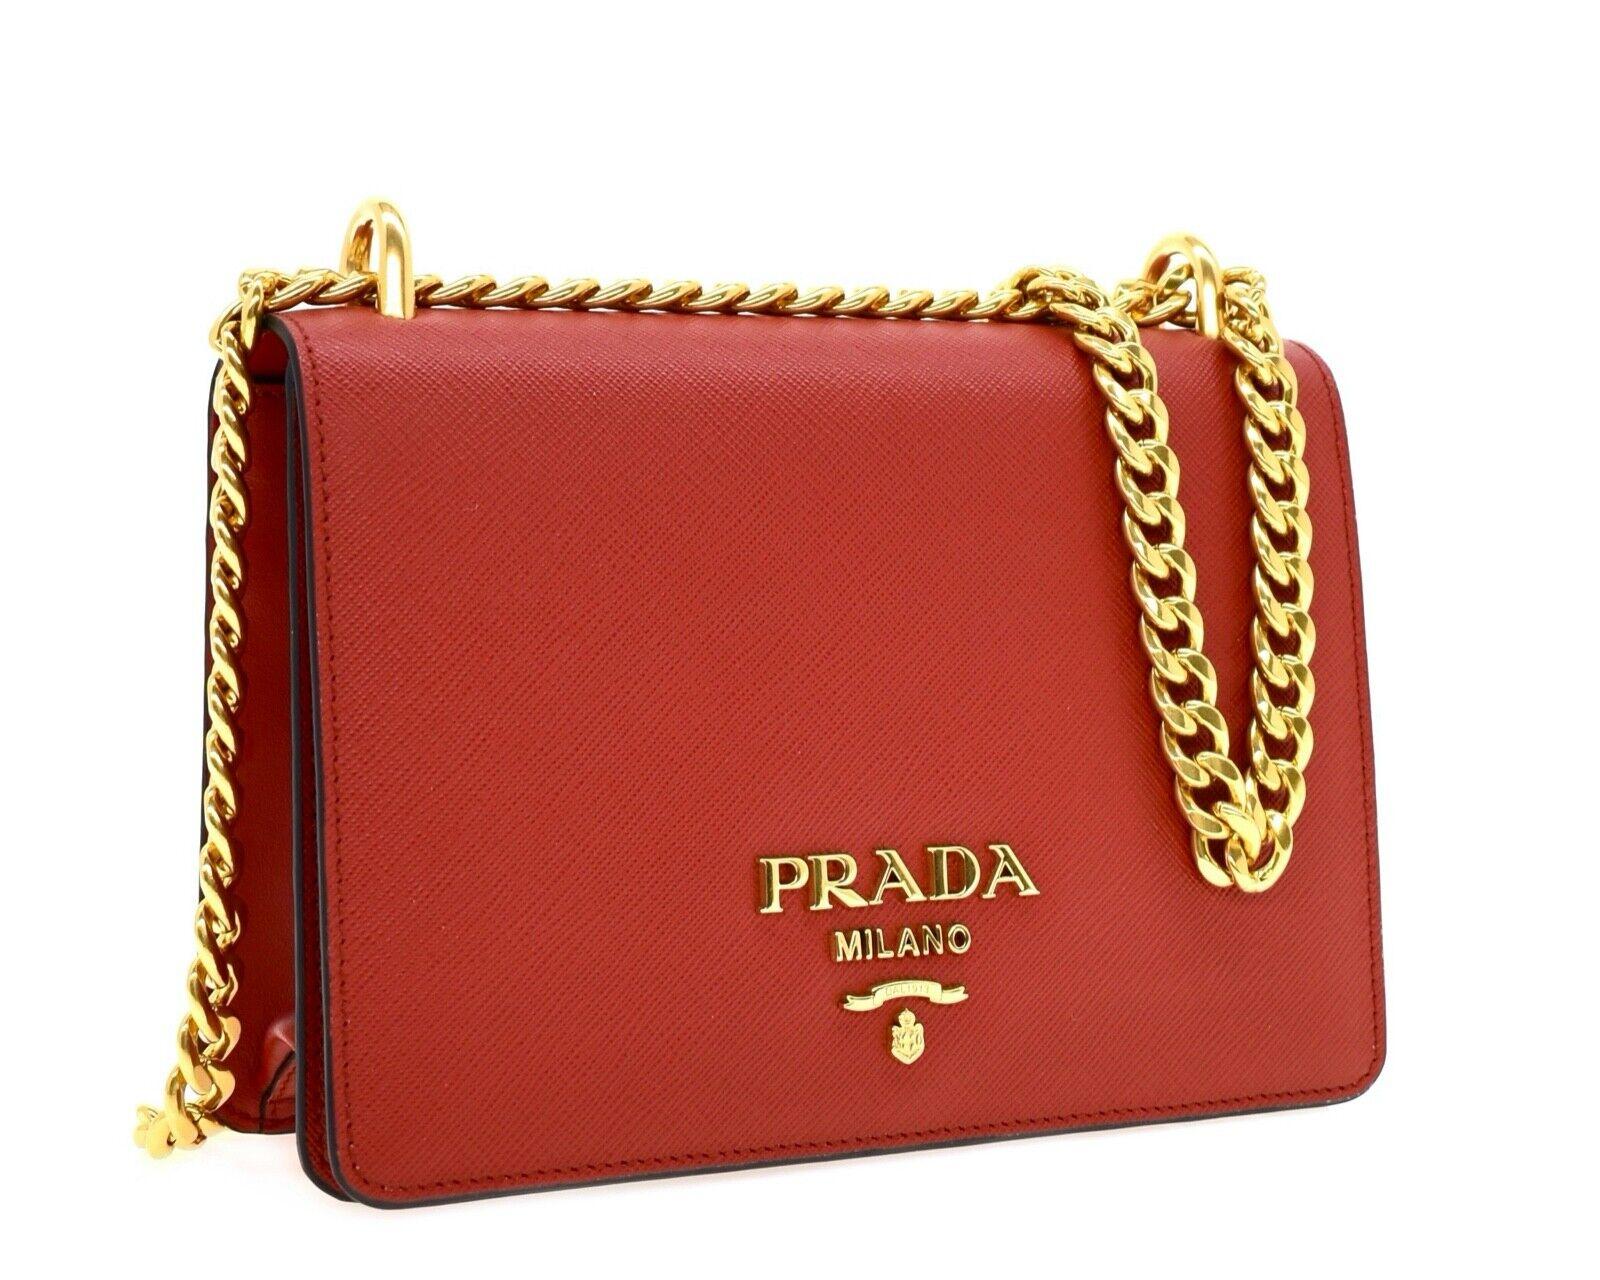 Prada Chain Crossbody Bag Red Saffiano Leather New